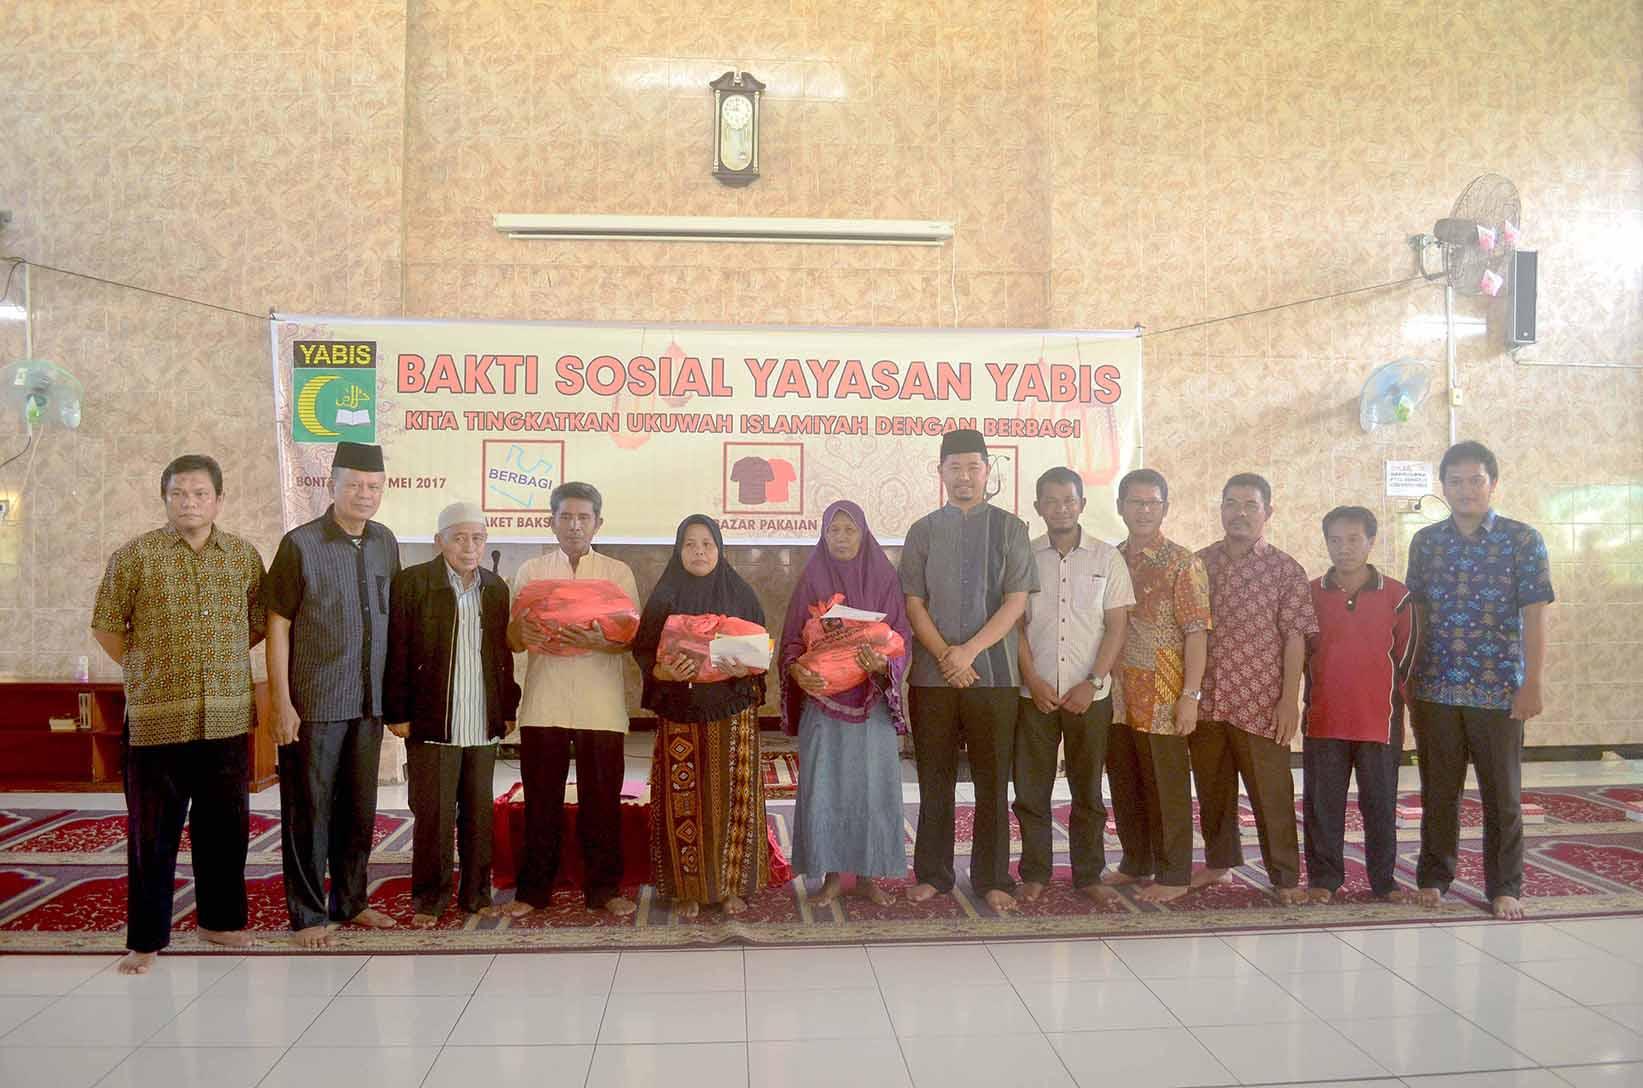 Sambut Ramadhan Yayasan Yabis Gelar Bakti Sosial tahun 2017